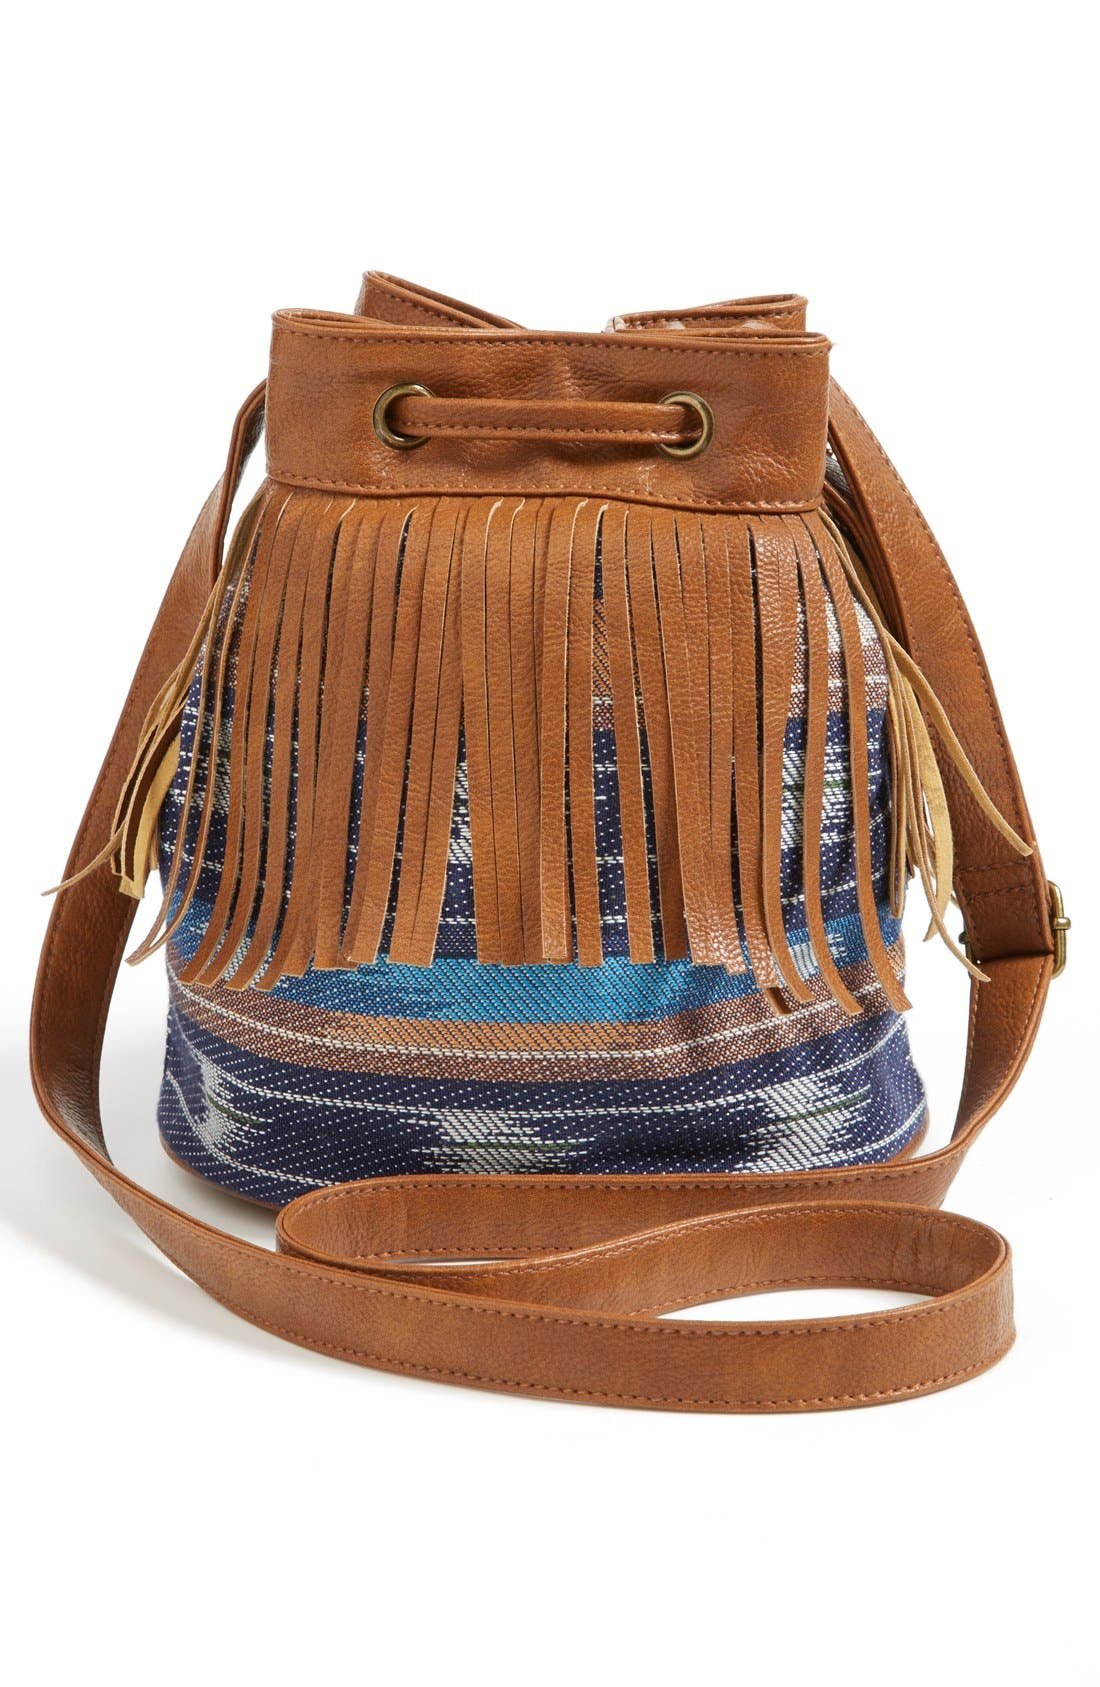 Alternate Image 3  - KENDALL + KYLIE Madden Girl Fringed Fabric Bucket Bag (Juniors)